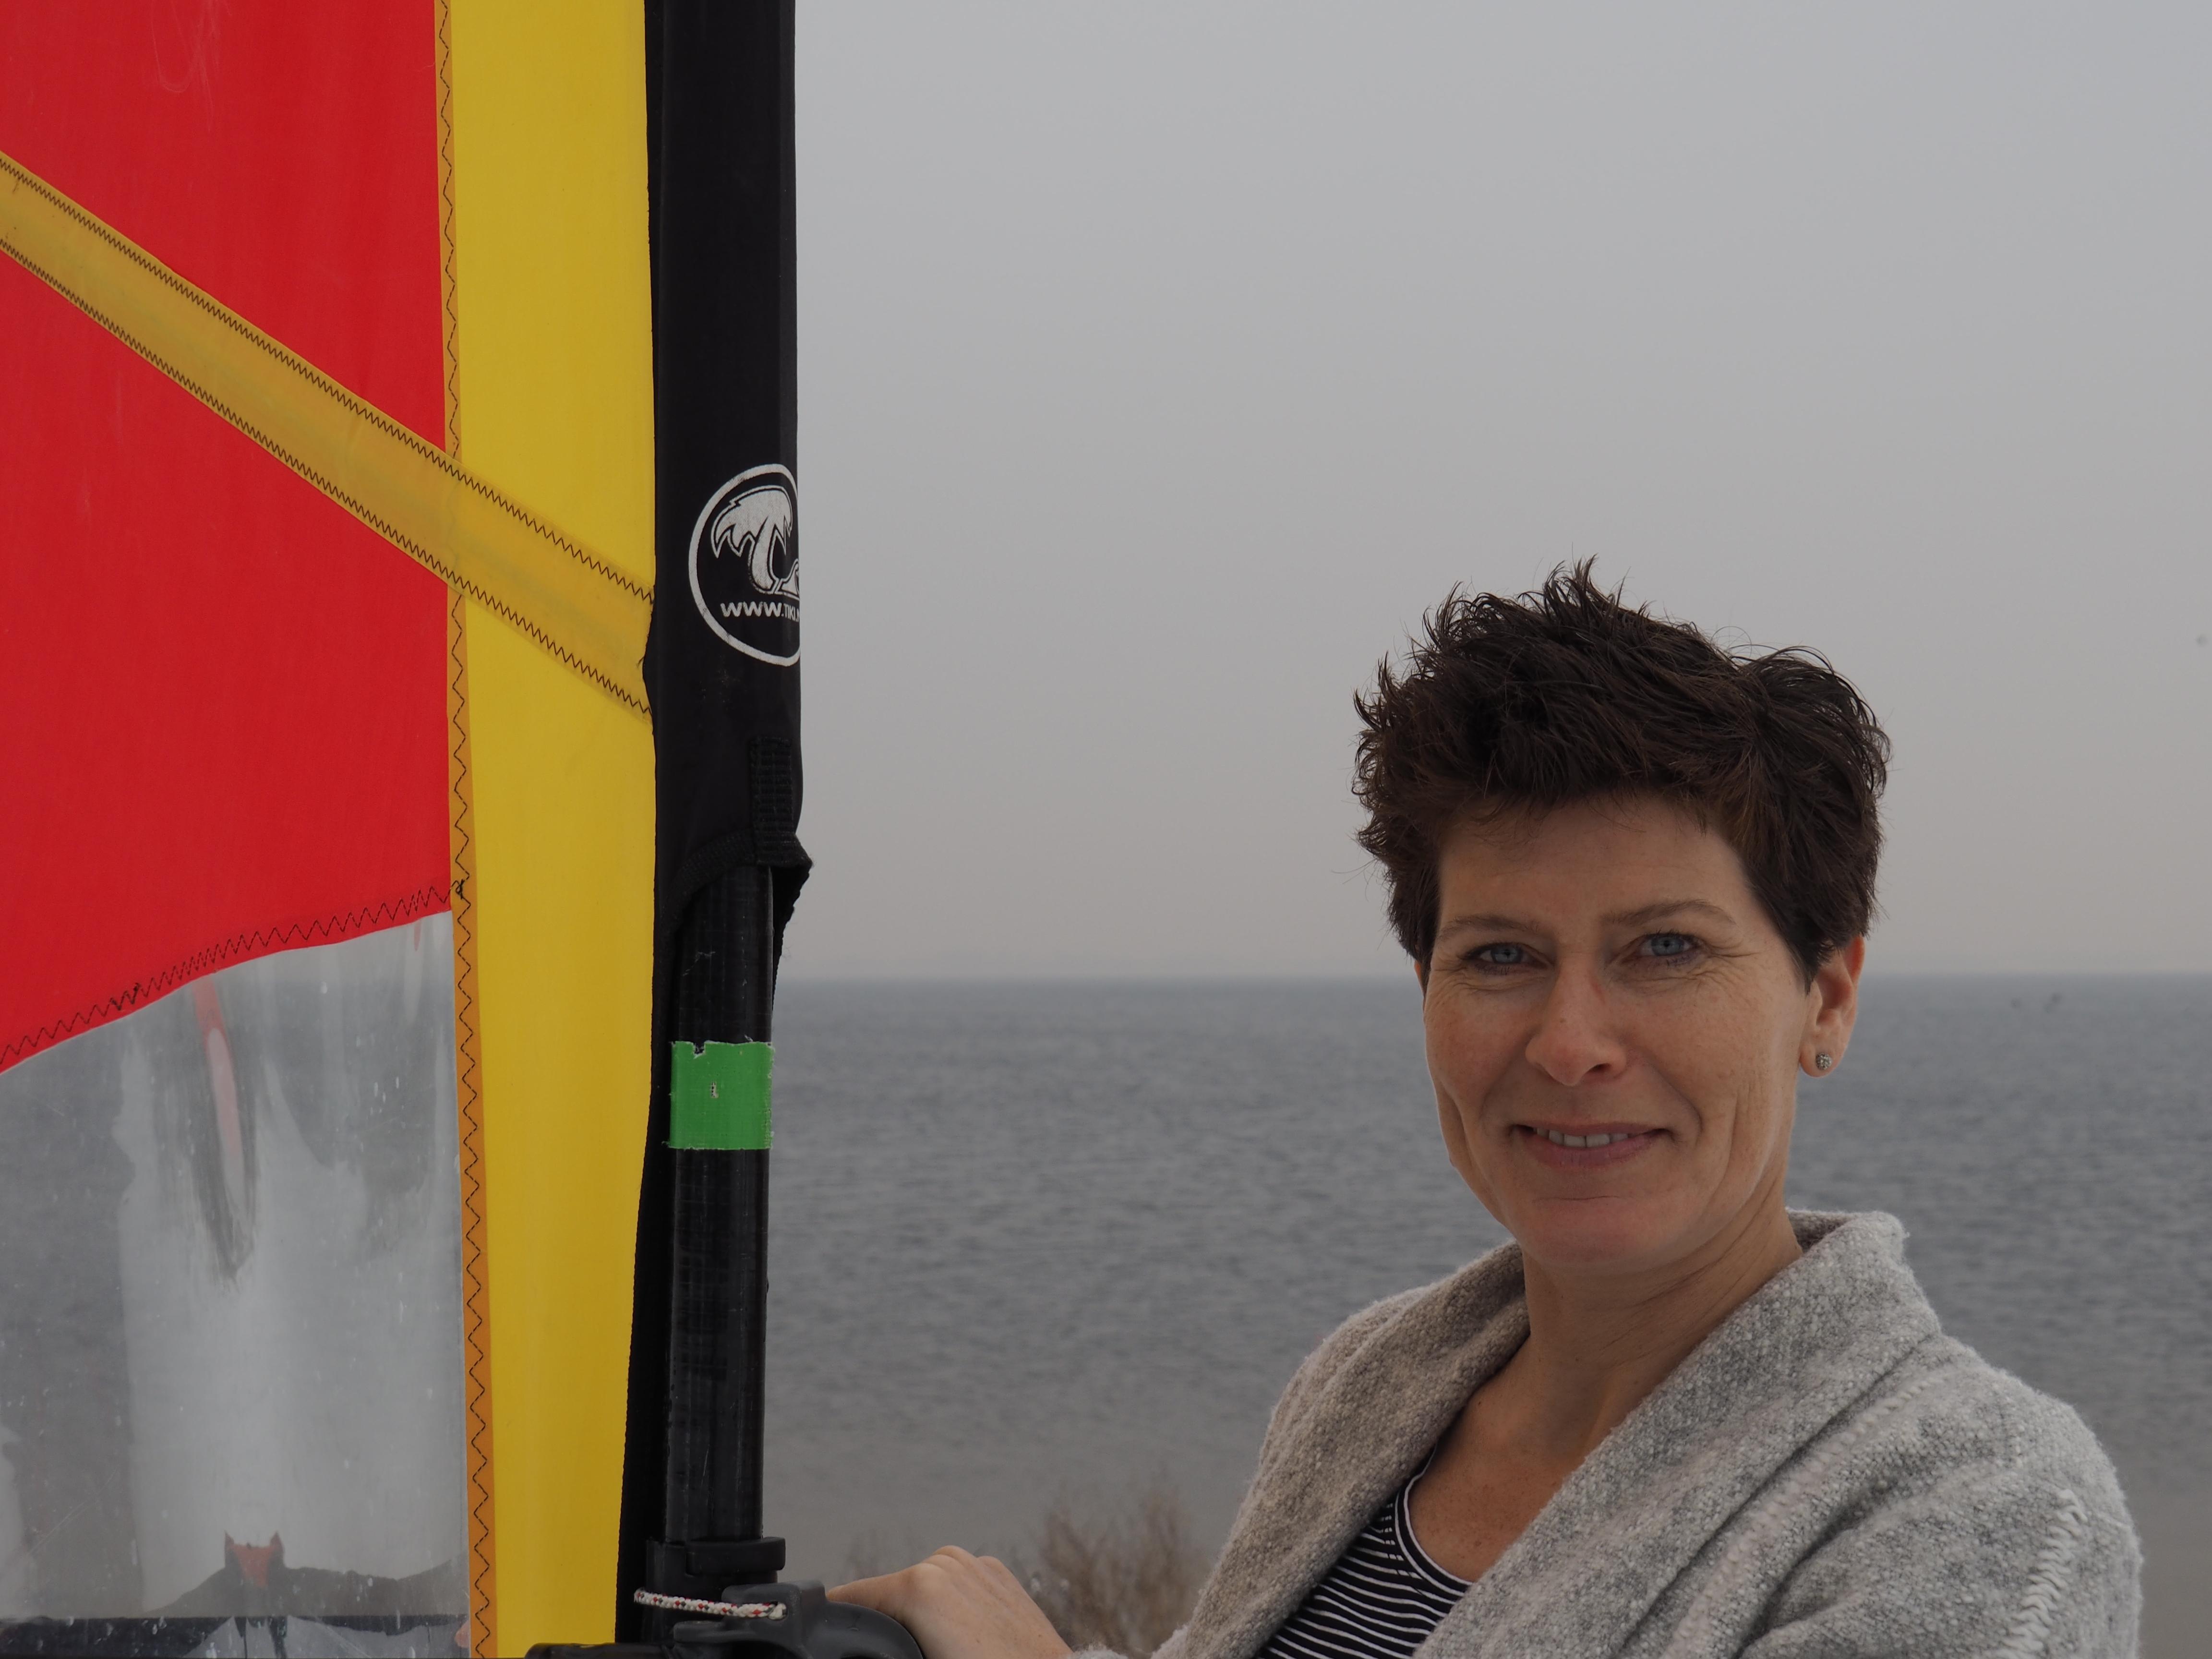 Angela Slingerland